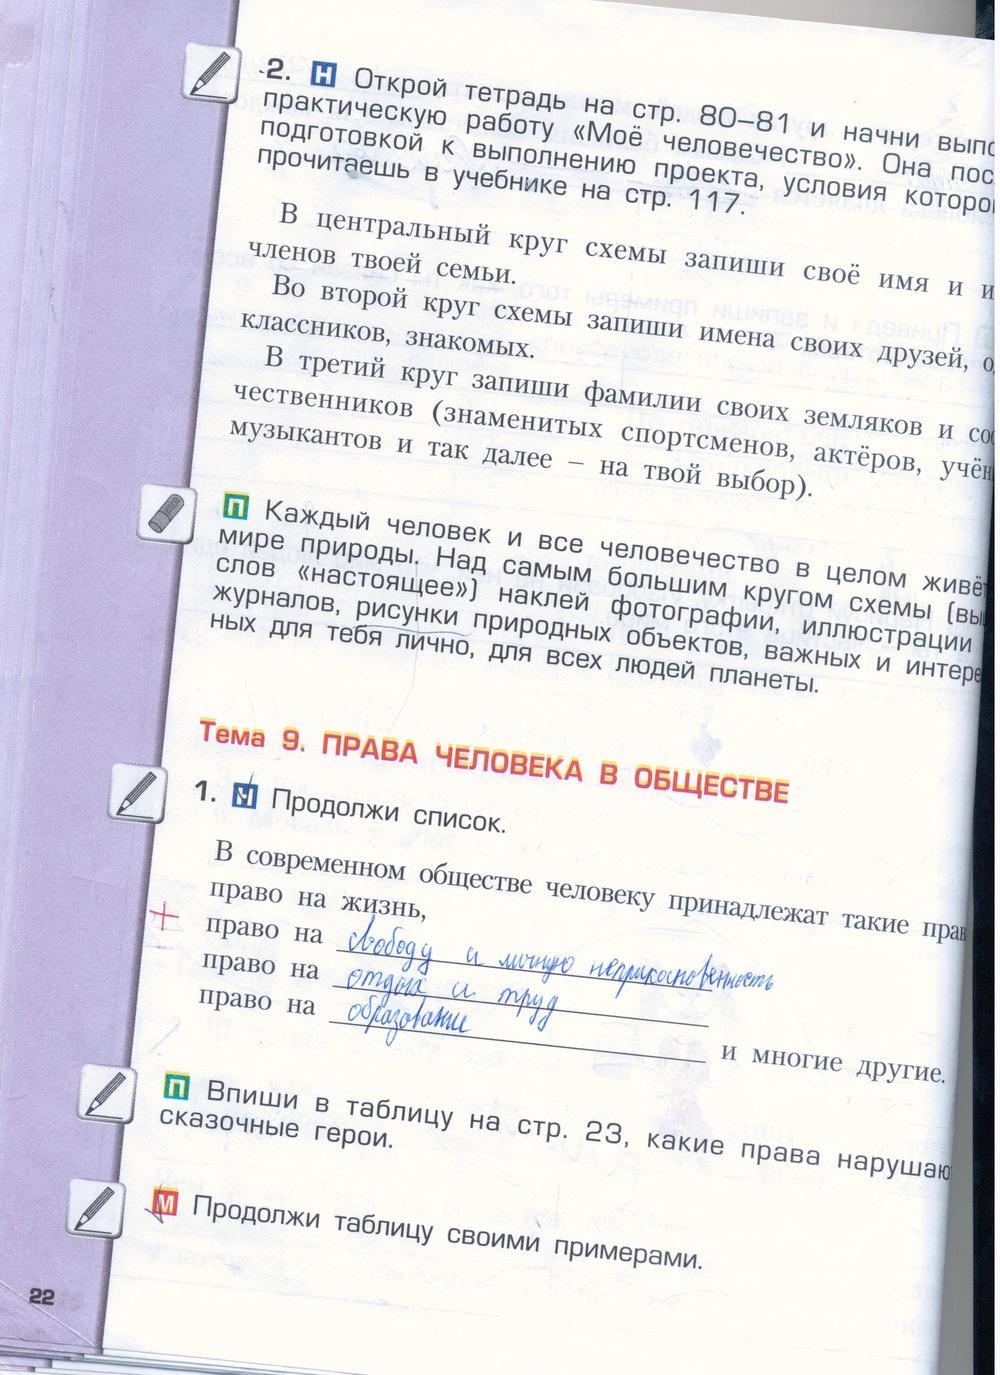 Решебник По Окр Миру 4 Класс Харитонова